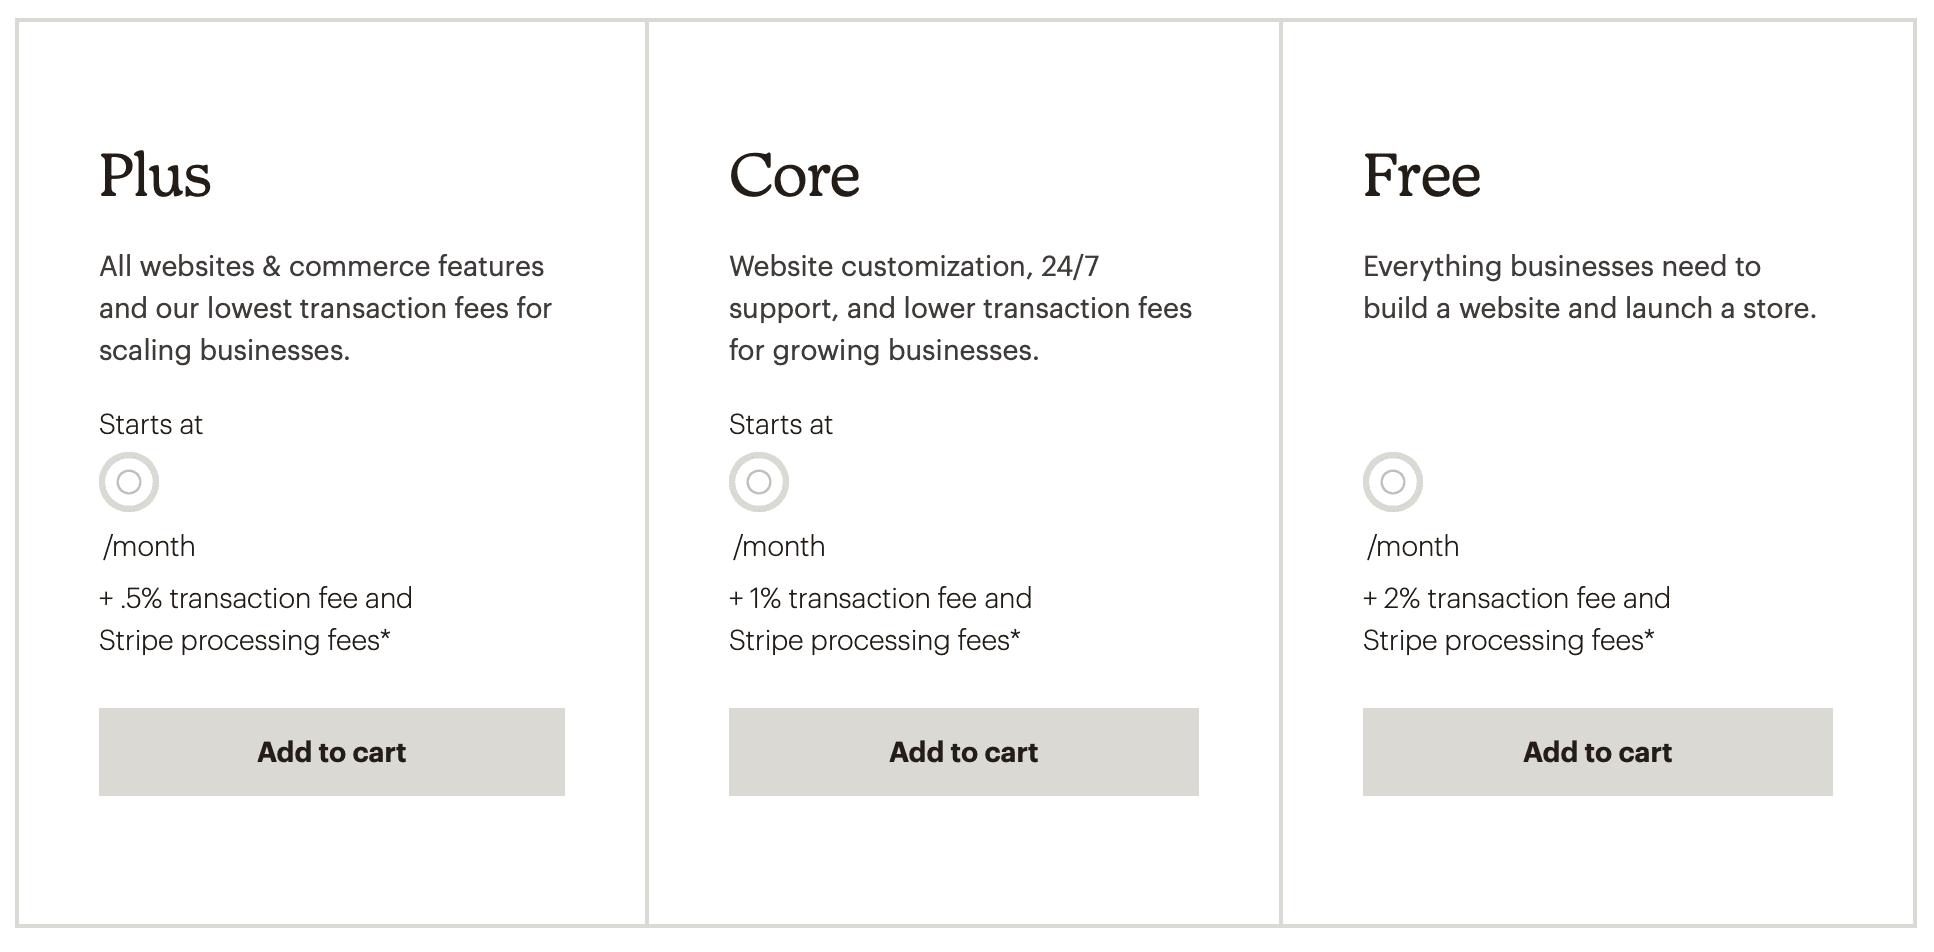 Mailchimp's website and commerce plans